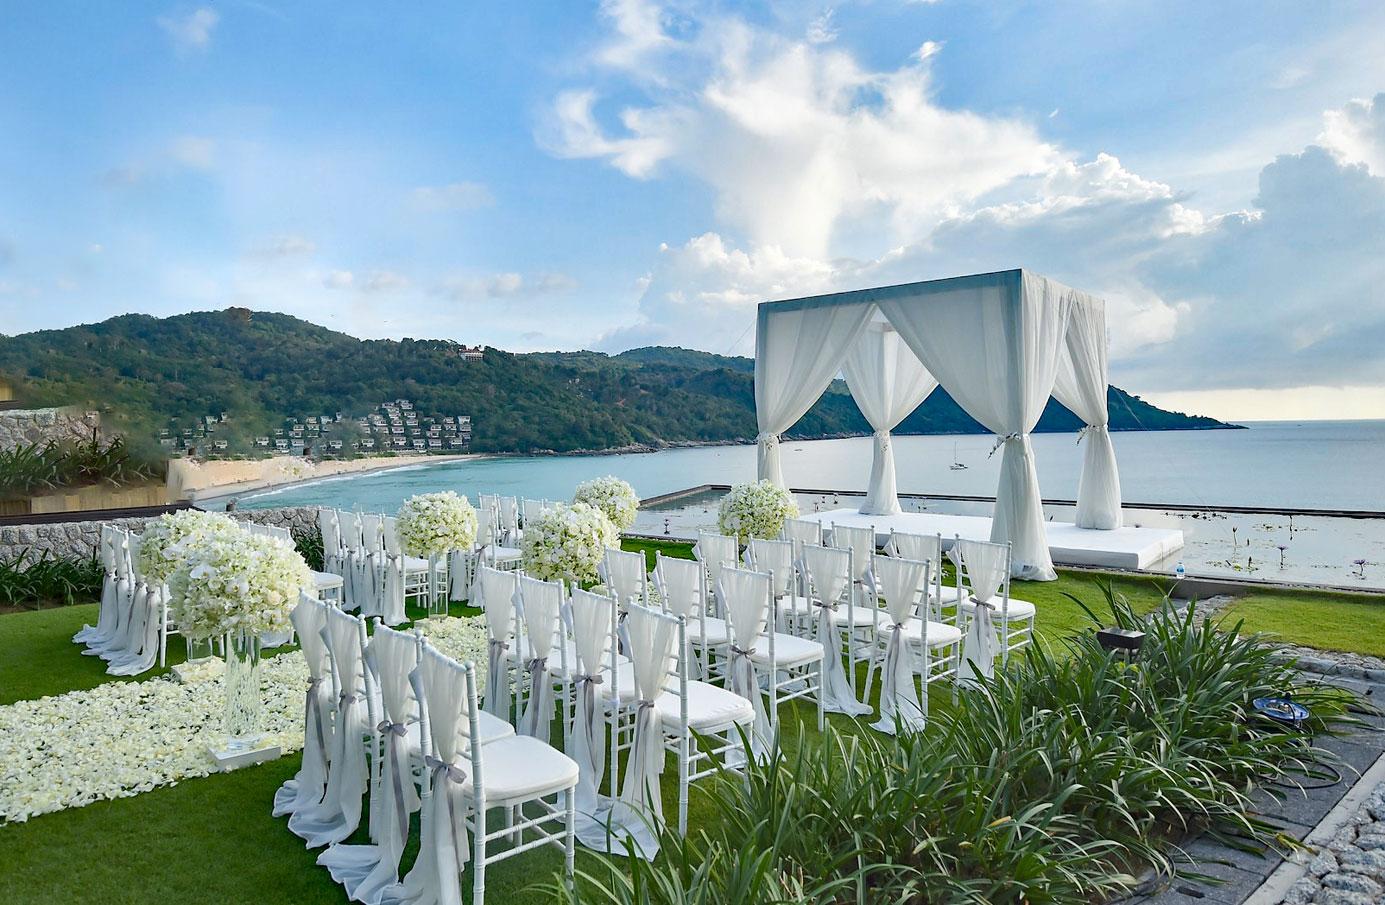 cebu-wedding-decoration (2)